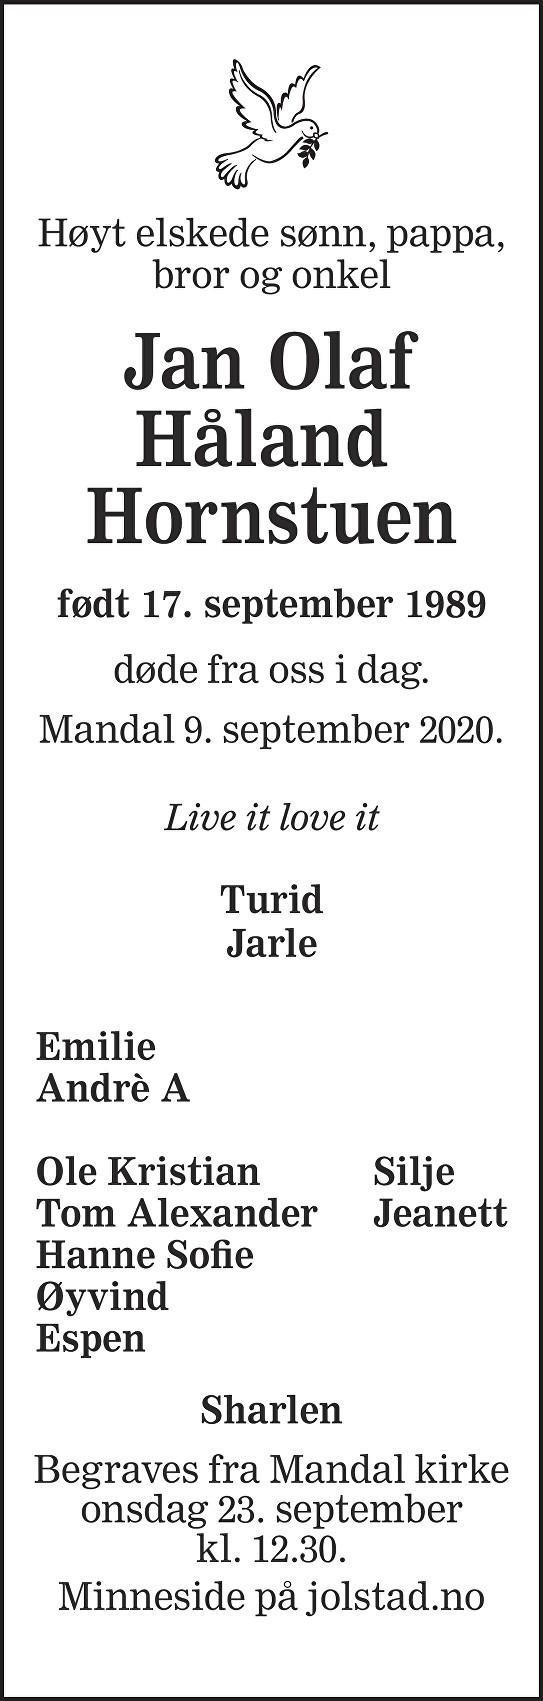 Jan Olaf Håland Hornstuen Dødsannonse